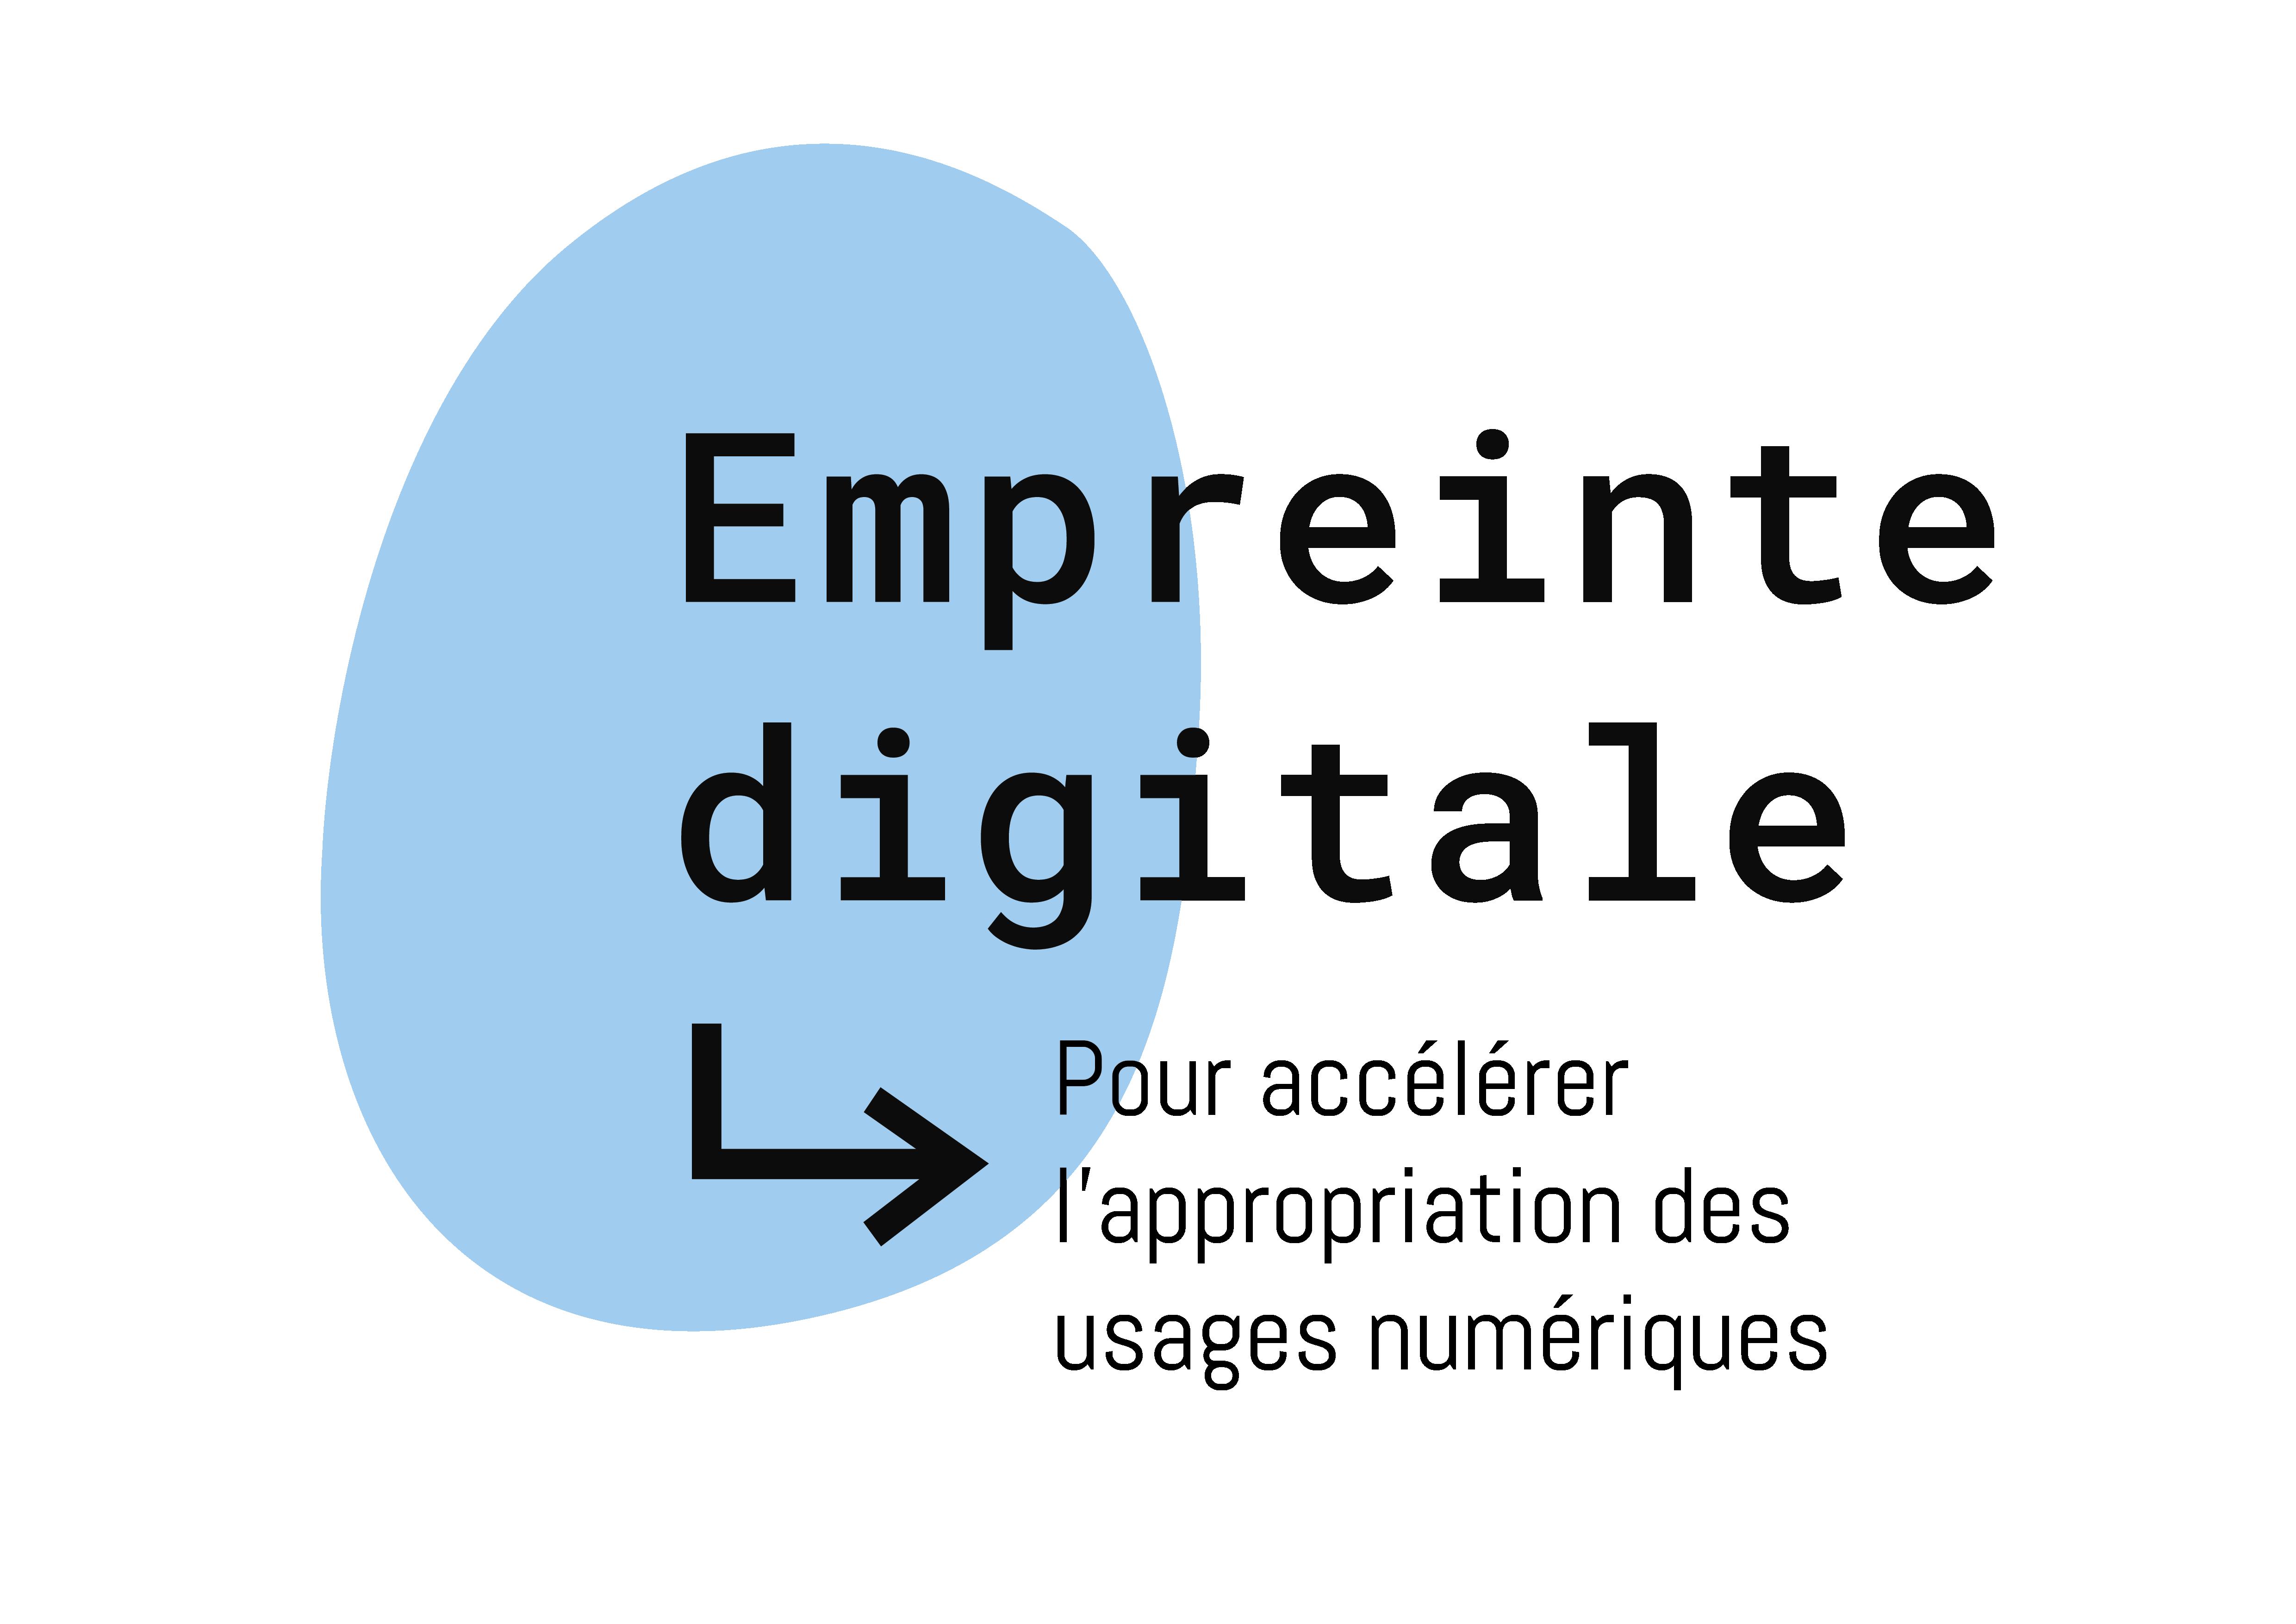 # INNOVATION PUBLIQUE Empreinte digitale